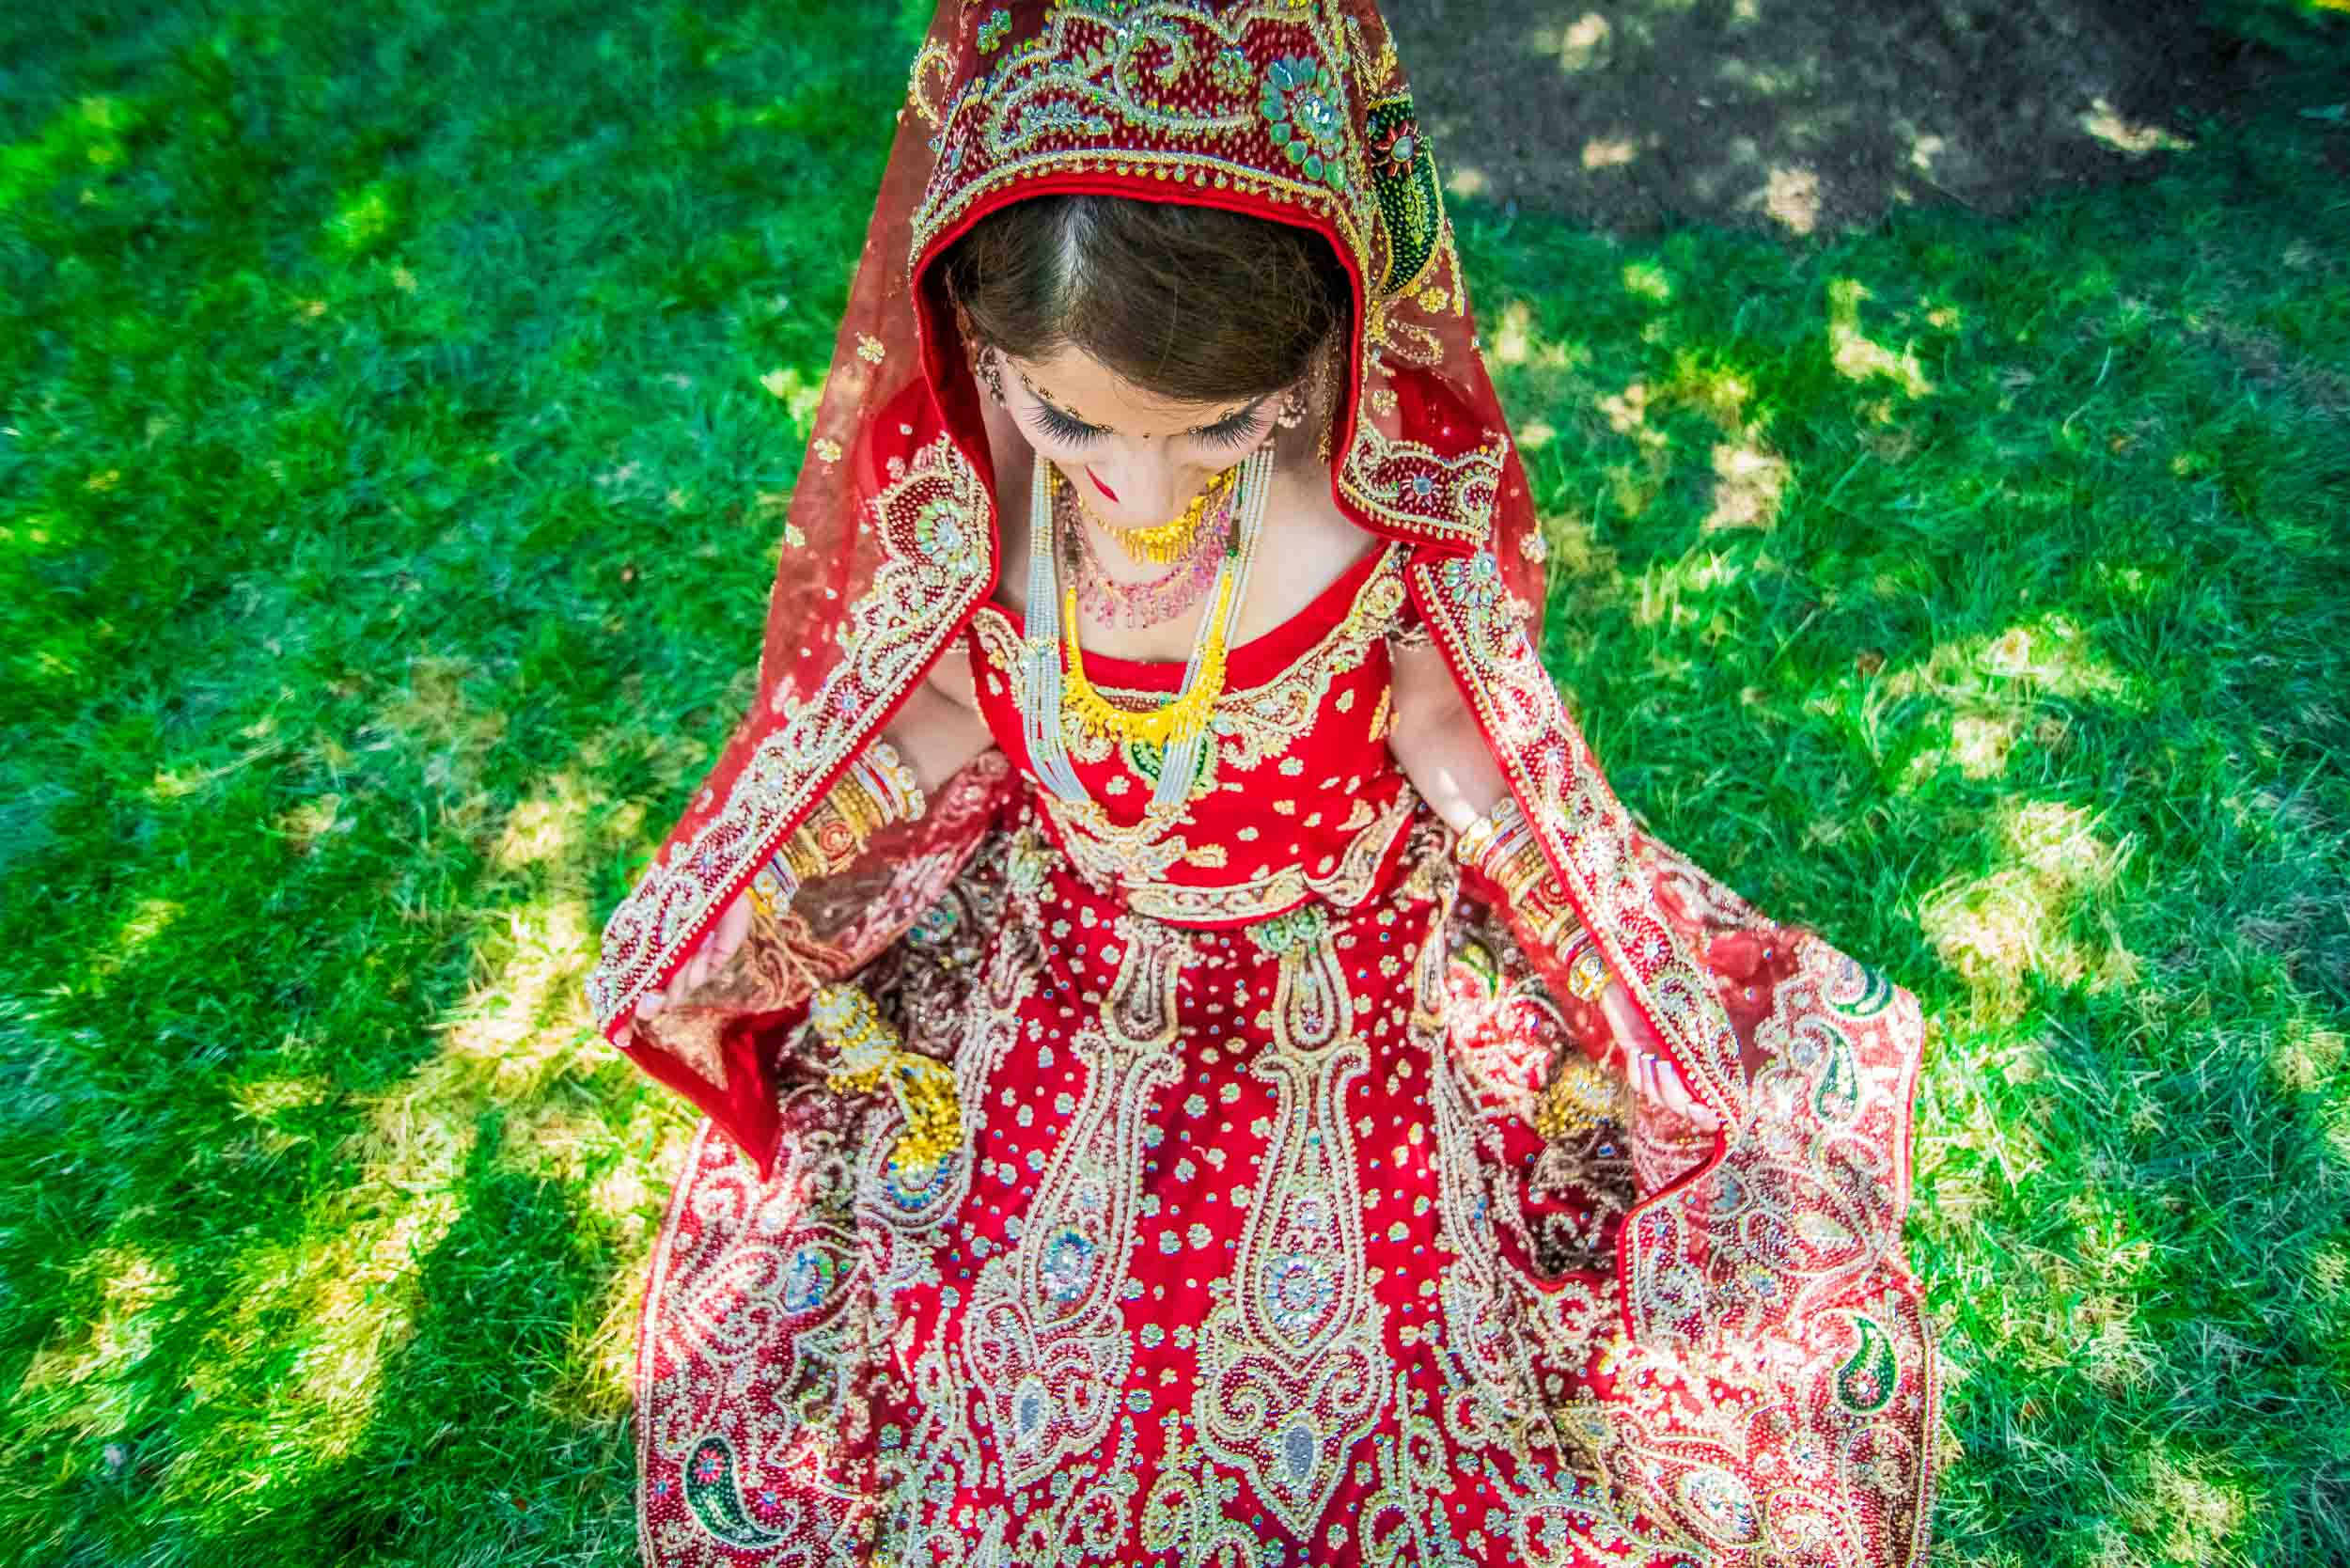 dc+metro+wedding+photographer+vadym+guliuk+photography+wedding+bride-2026.jpg